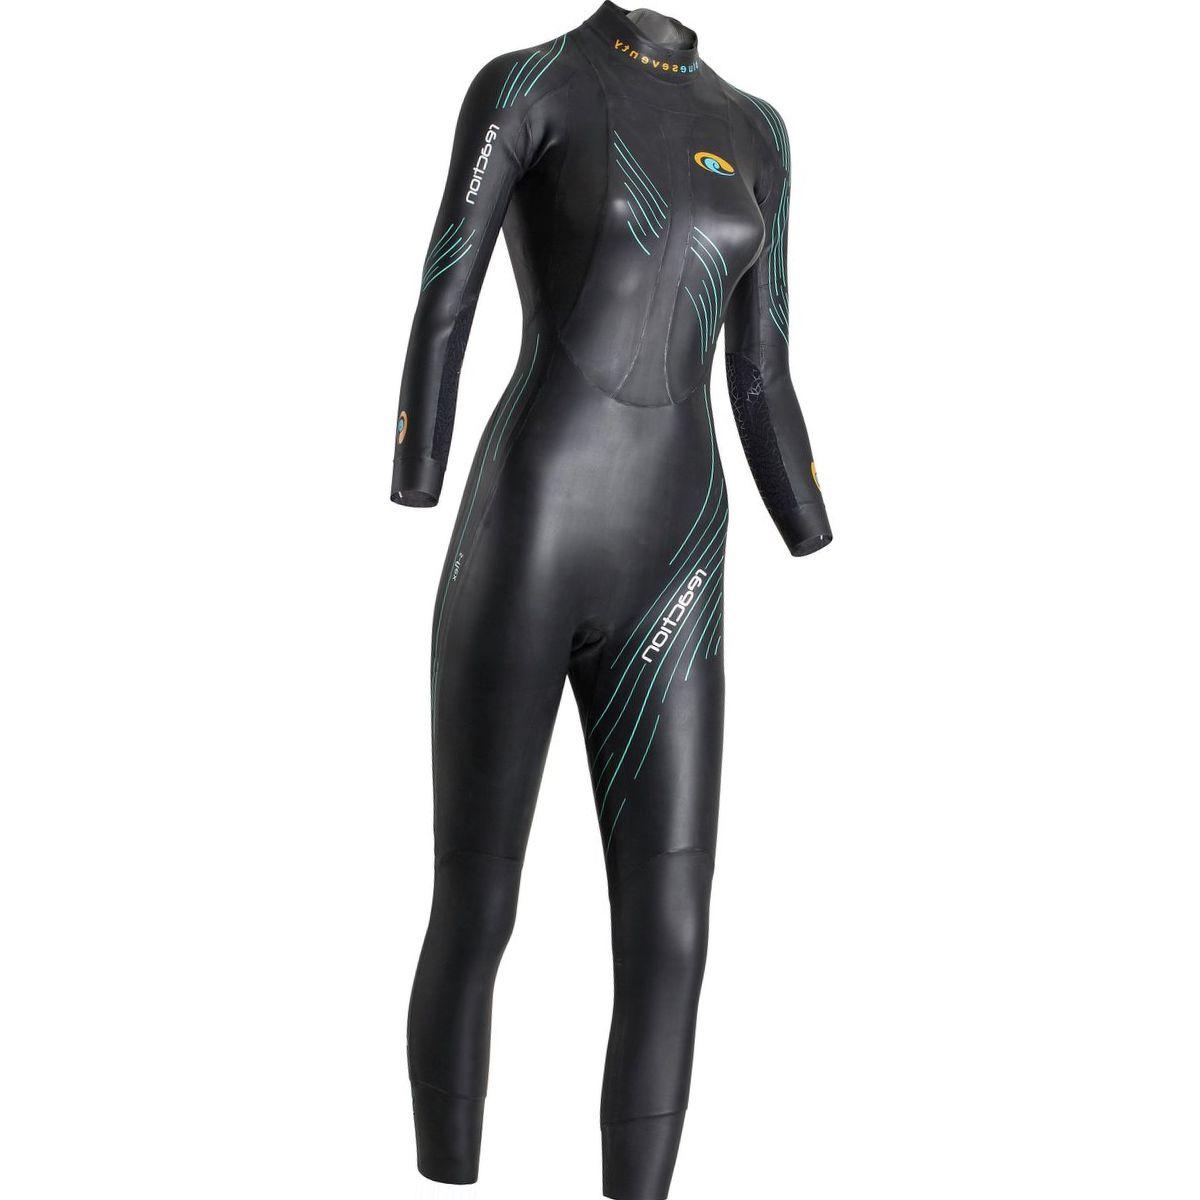 Blueseventy Reaction Full Wetsuit - Women's